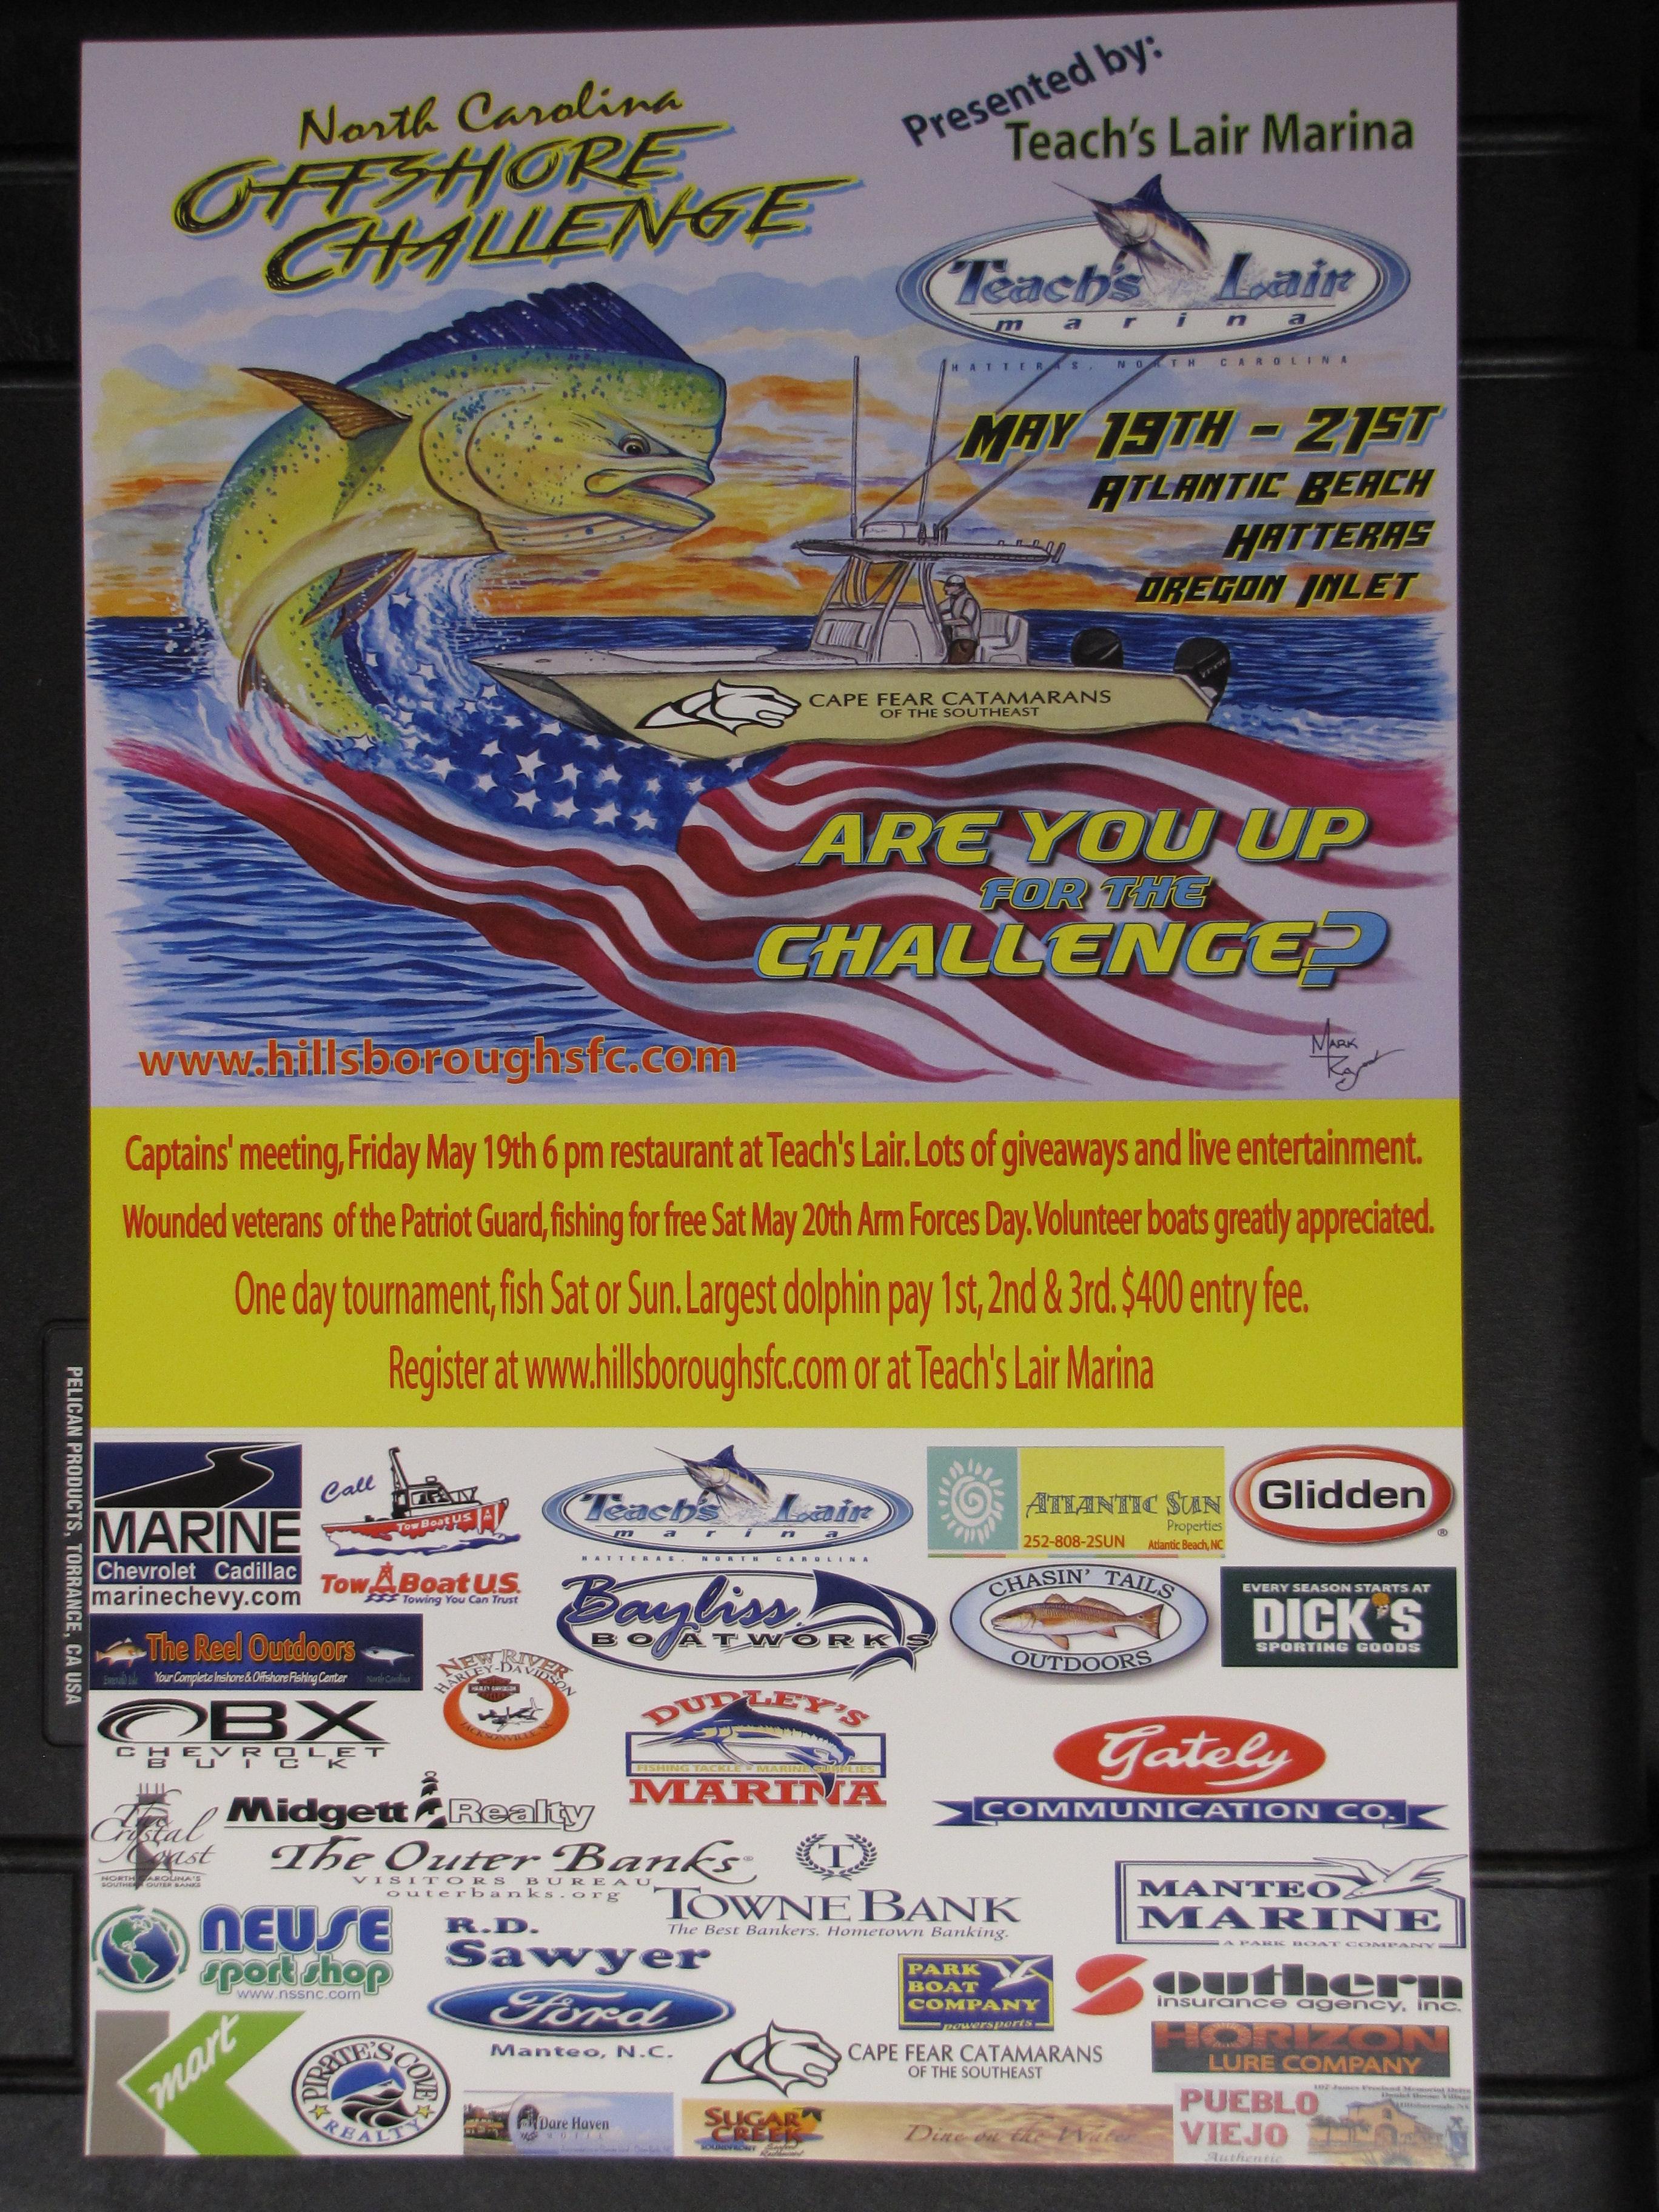 Dolphin Tournament, Fun, Fishing Hatteras, Prizes,